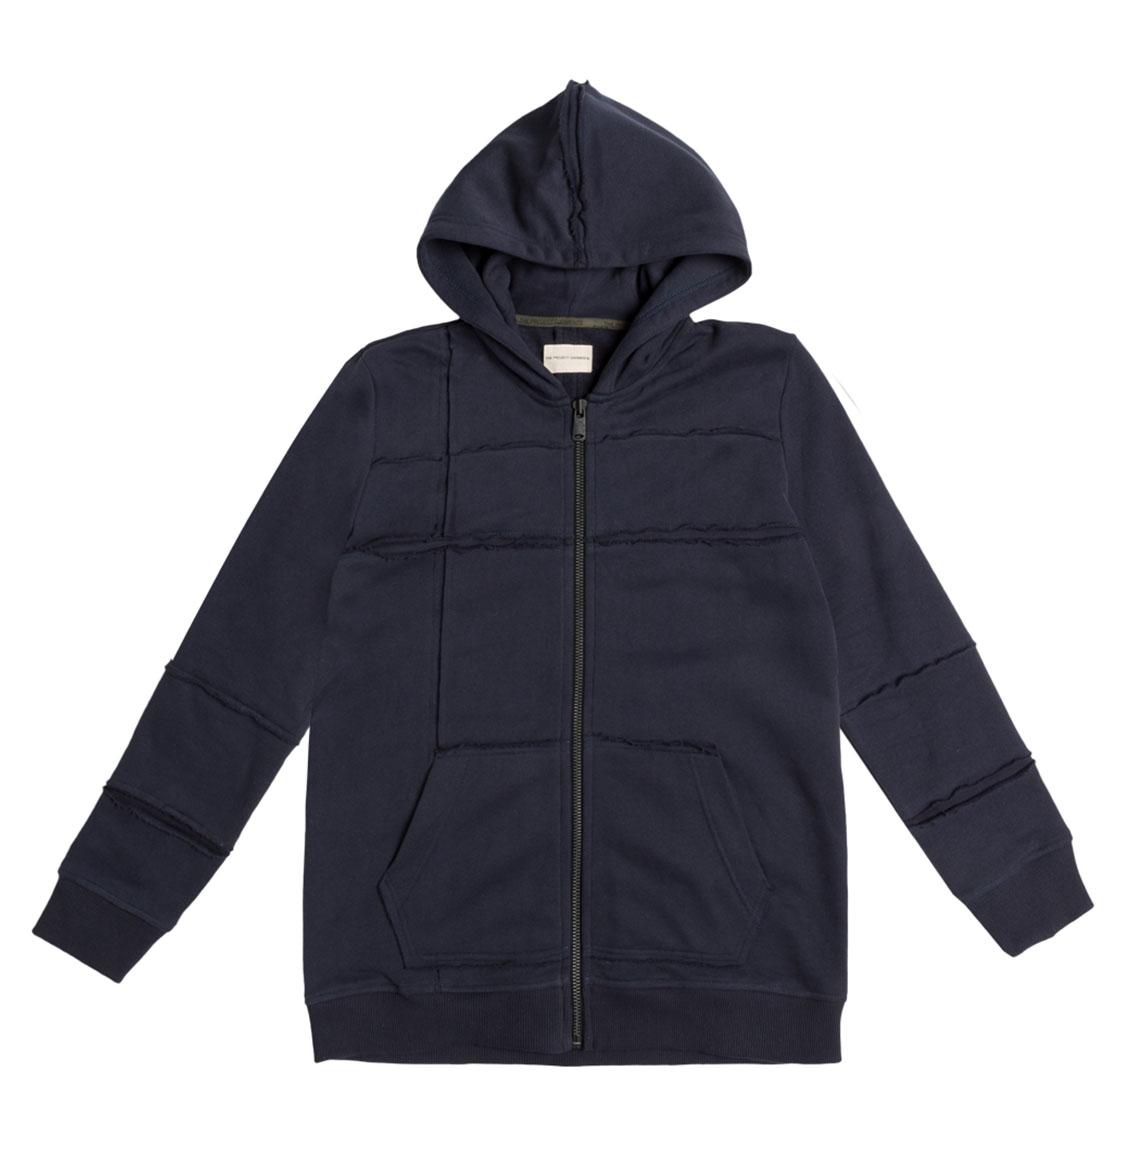 Organic Cotton Laser Cut Zip Up Hoodie Navy Blue